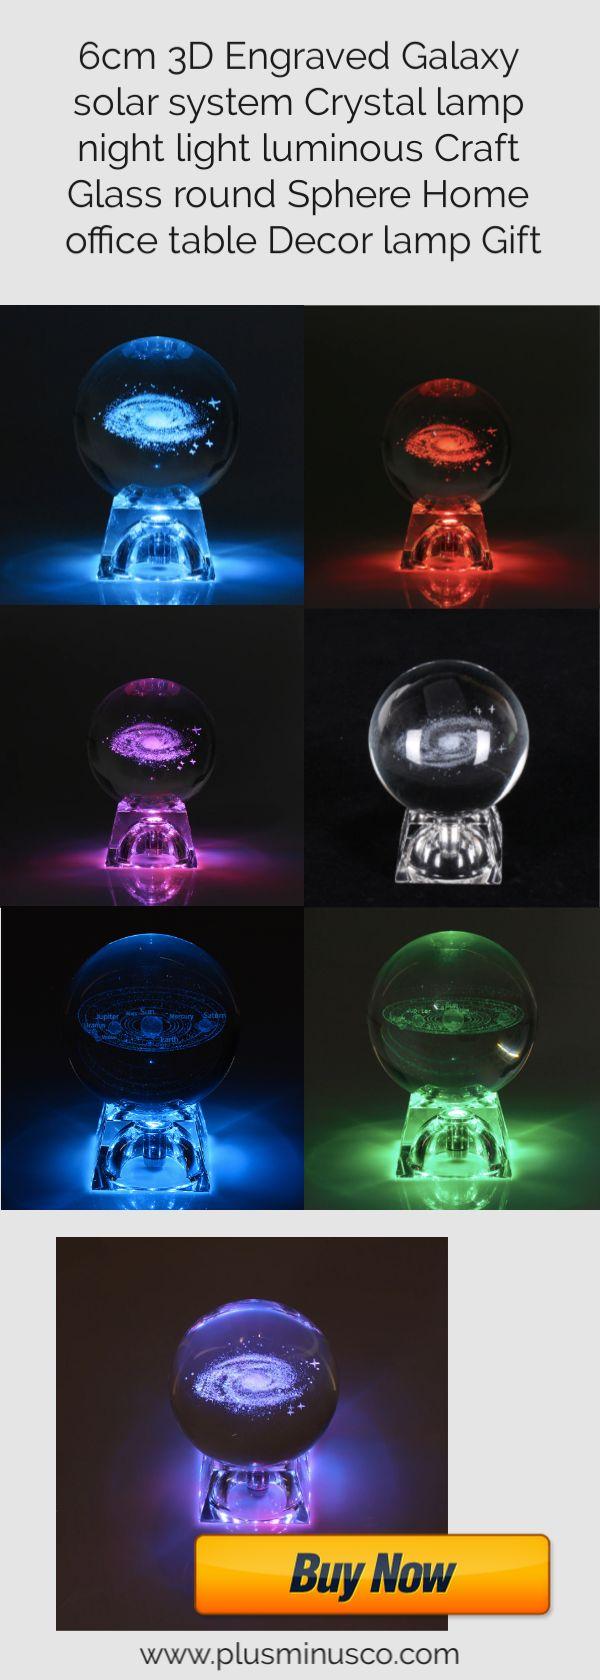 6cm 3d Engraved Galaxy Solar System Crystal Lamp Night Light Luminous Craft Glass Round Sphere Home Crystal Lamp Night Light Galaxy Solar System